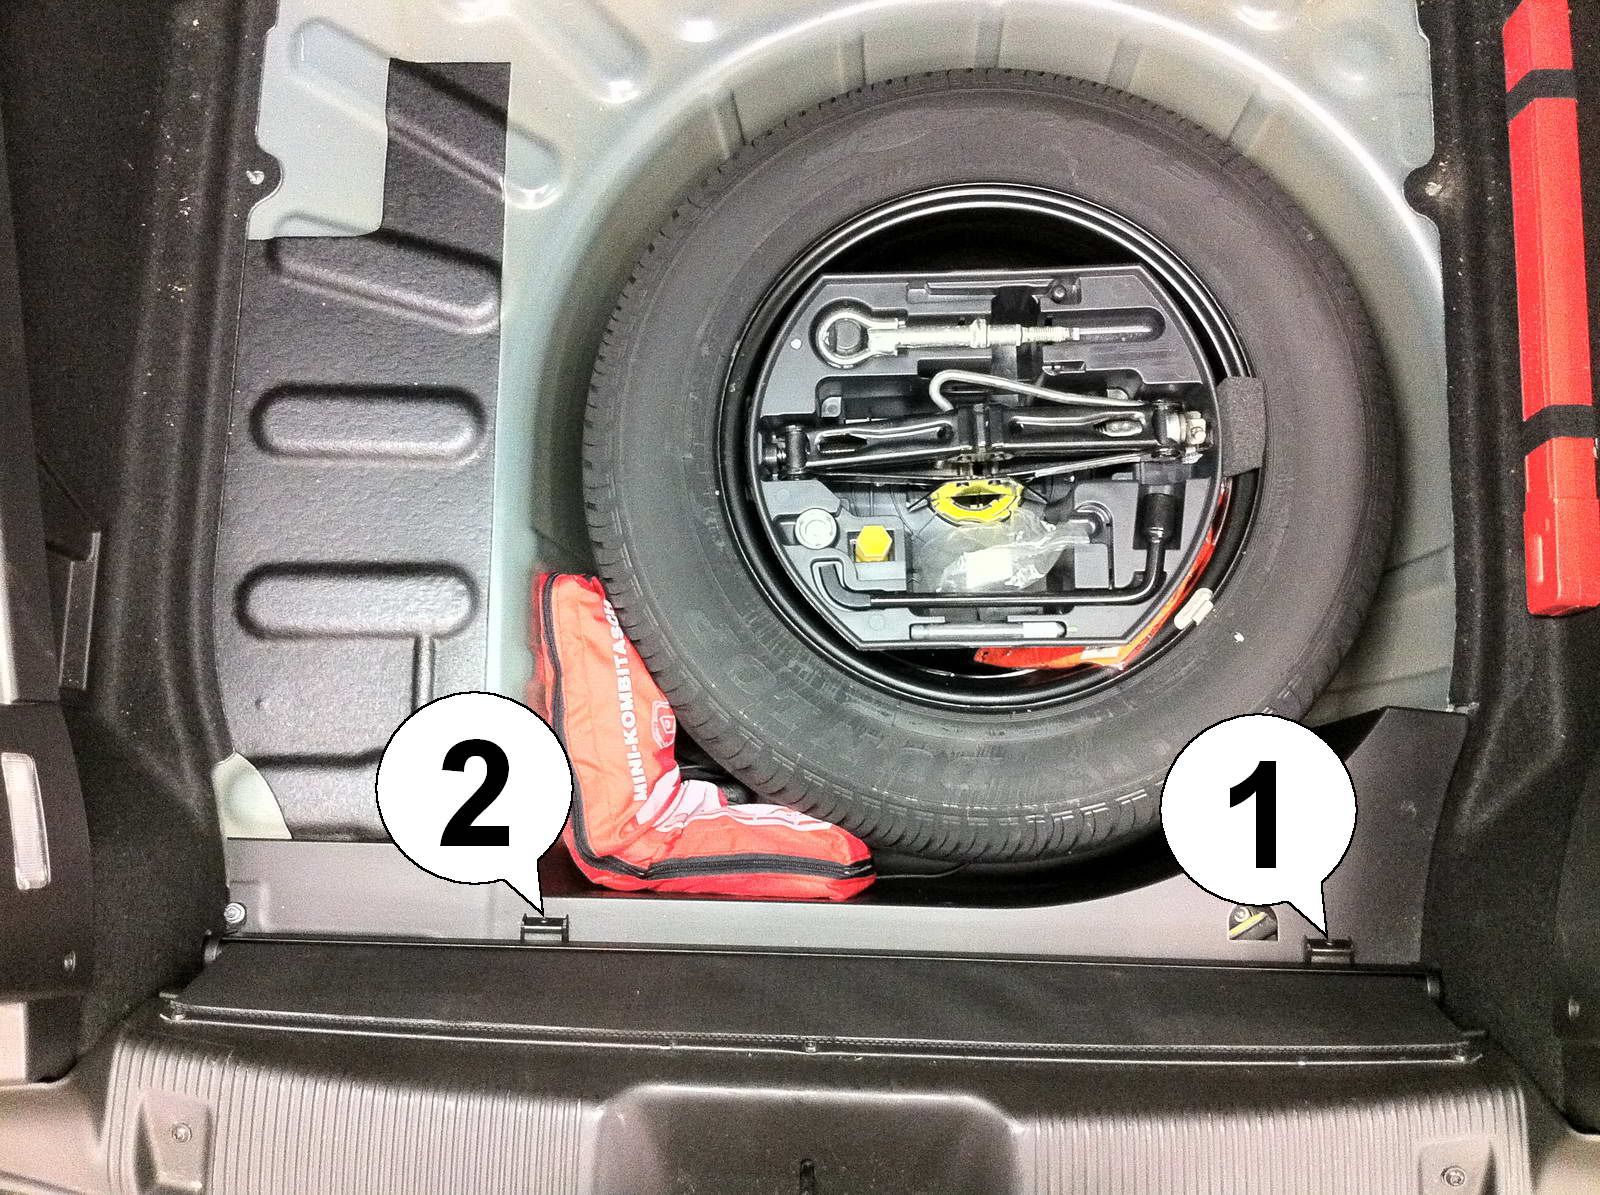 mods4cars product manual rh mods4cars com Peugeot 307 2001 peugeot 307 cc manual roof operation